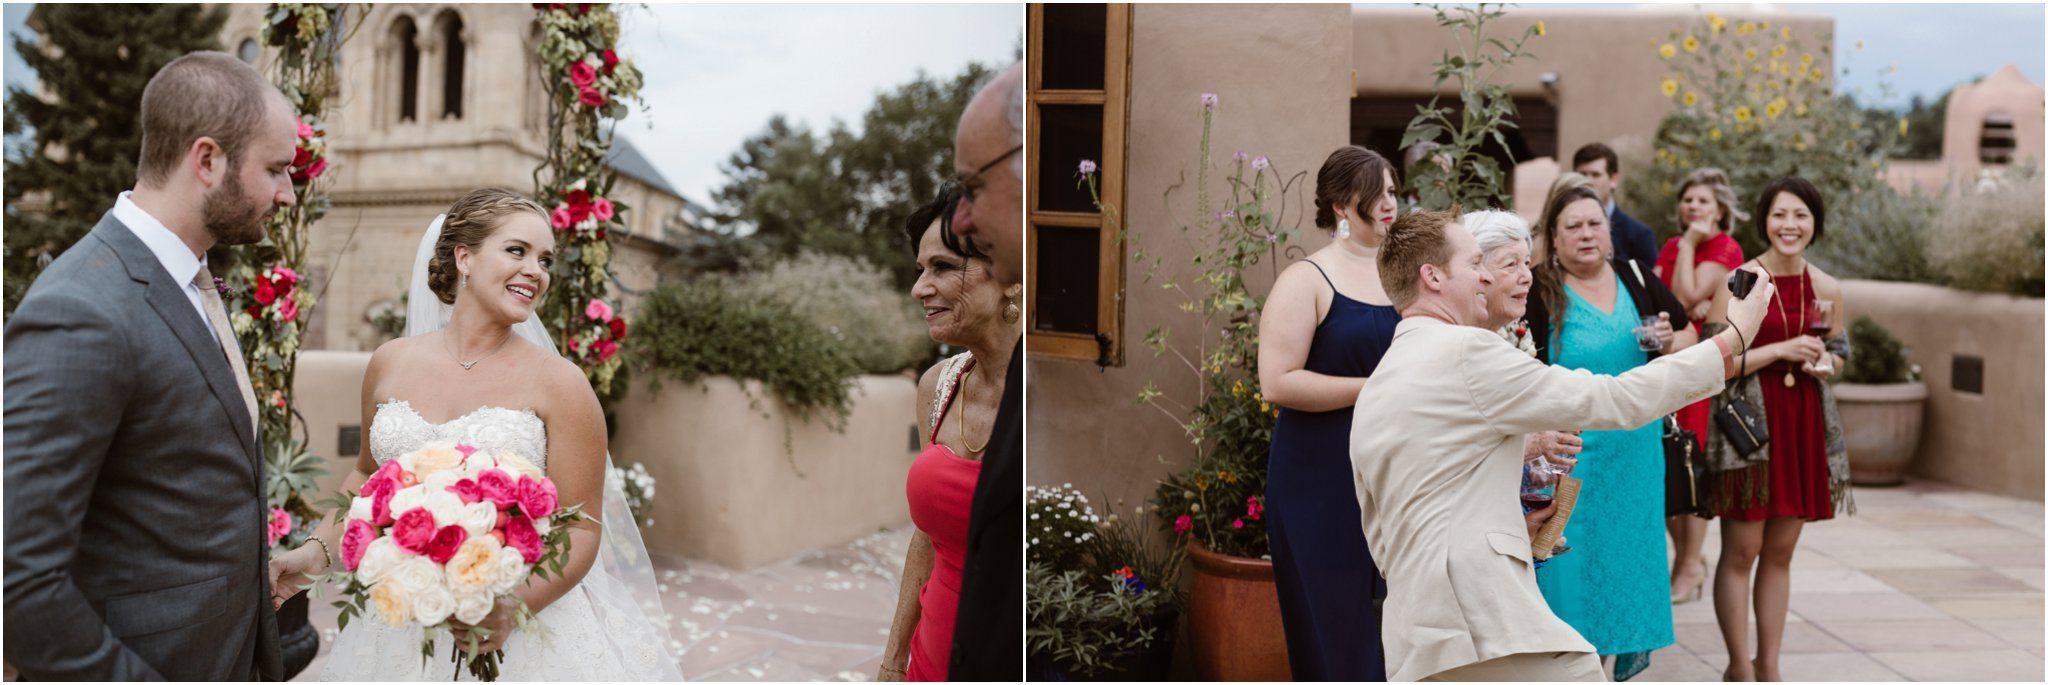 0051albuquerque-wedding-photographer_-santa-fe-wedding-photographer_-southwest-wedding-photography_-blue-rose-studio